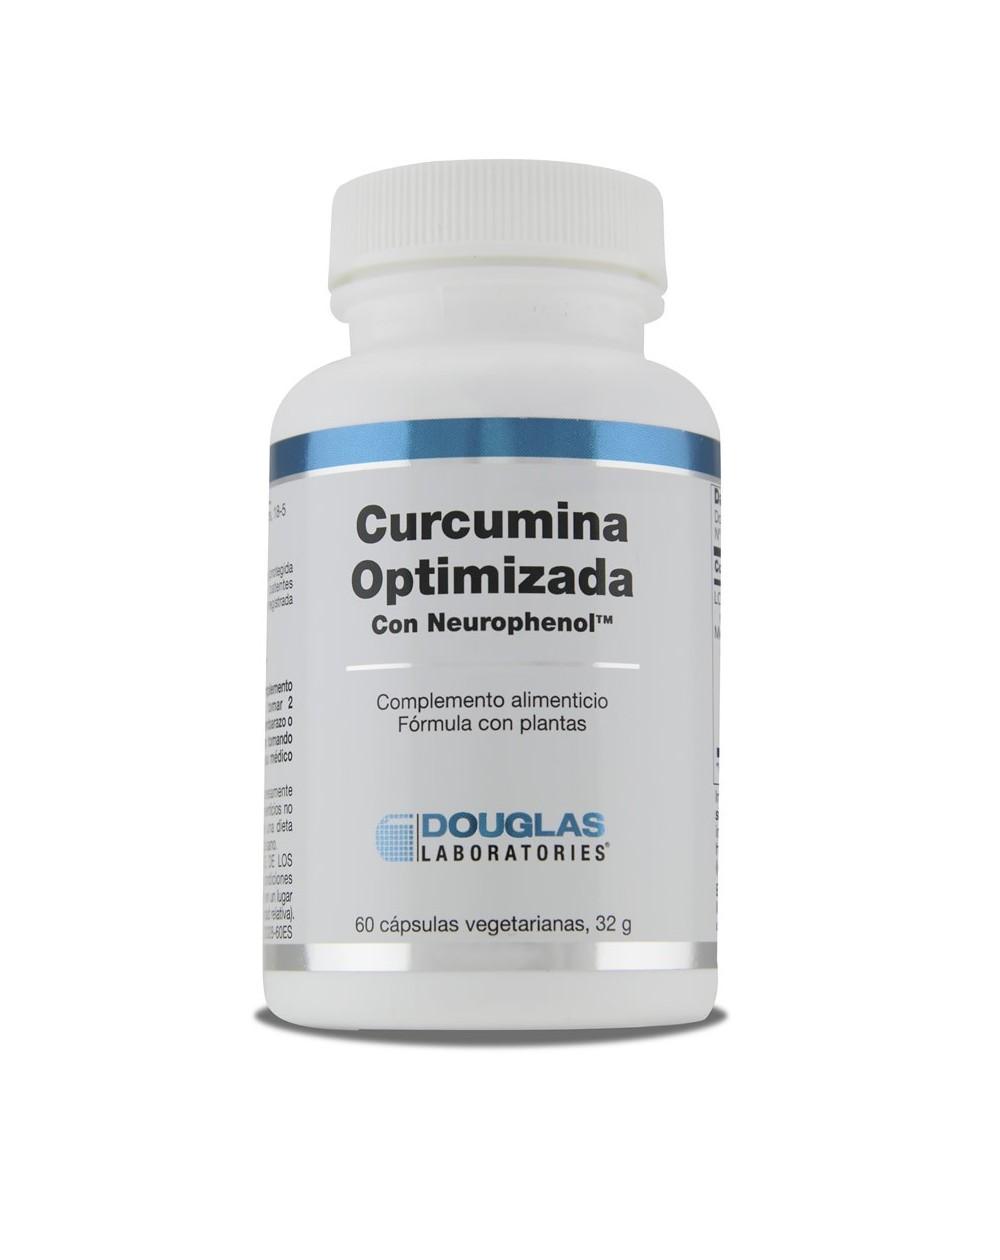 Curcumina optimizada con Neurophenol...